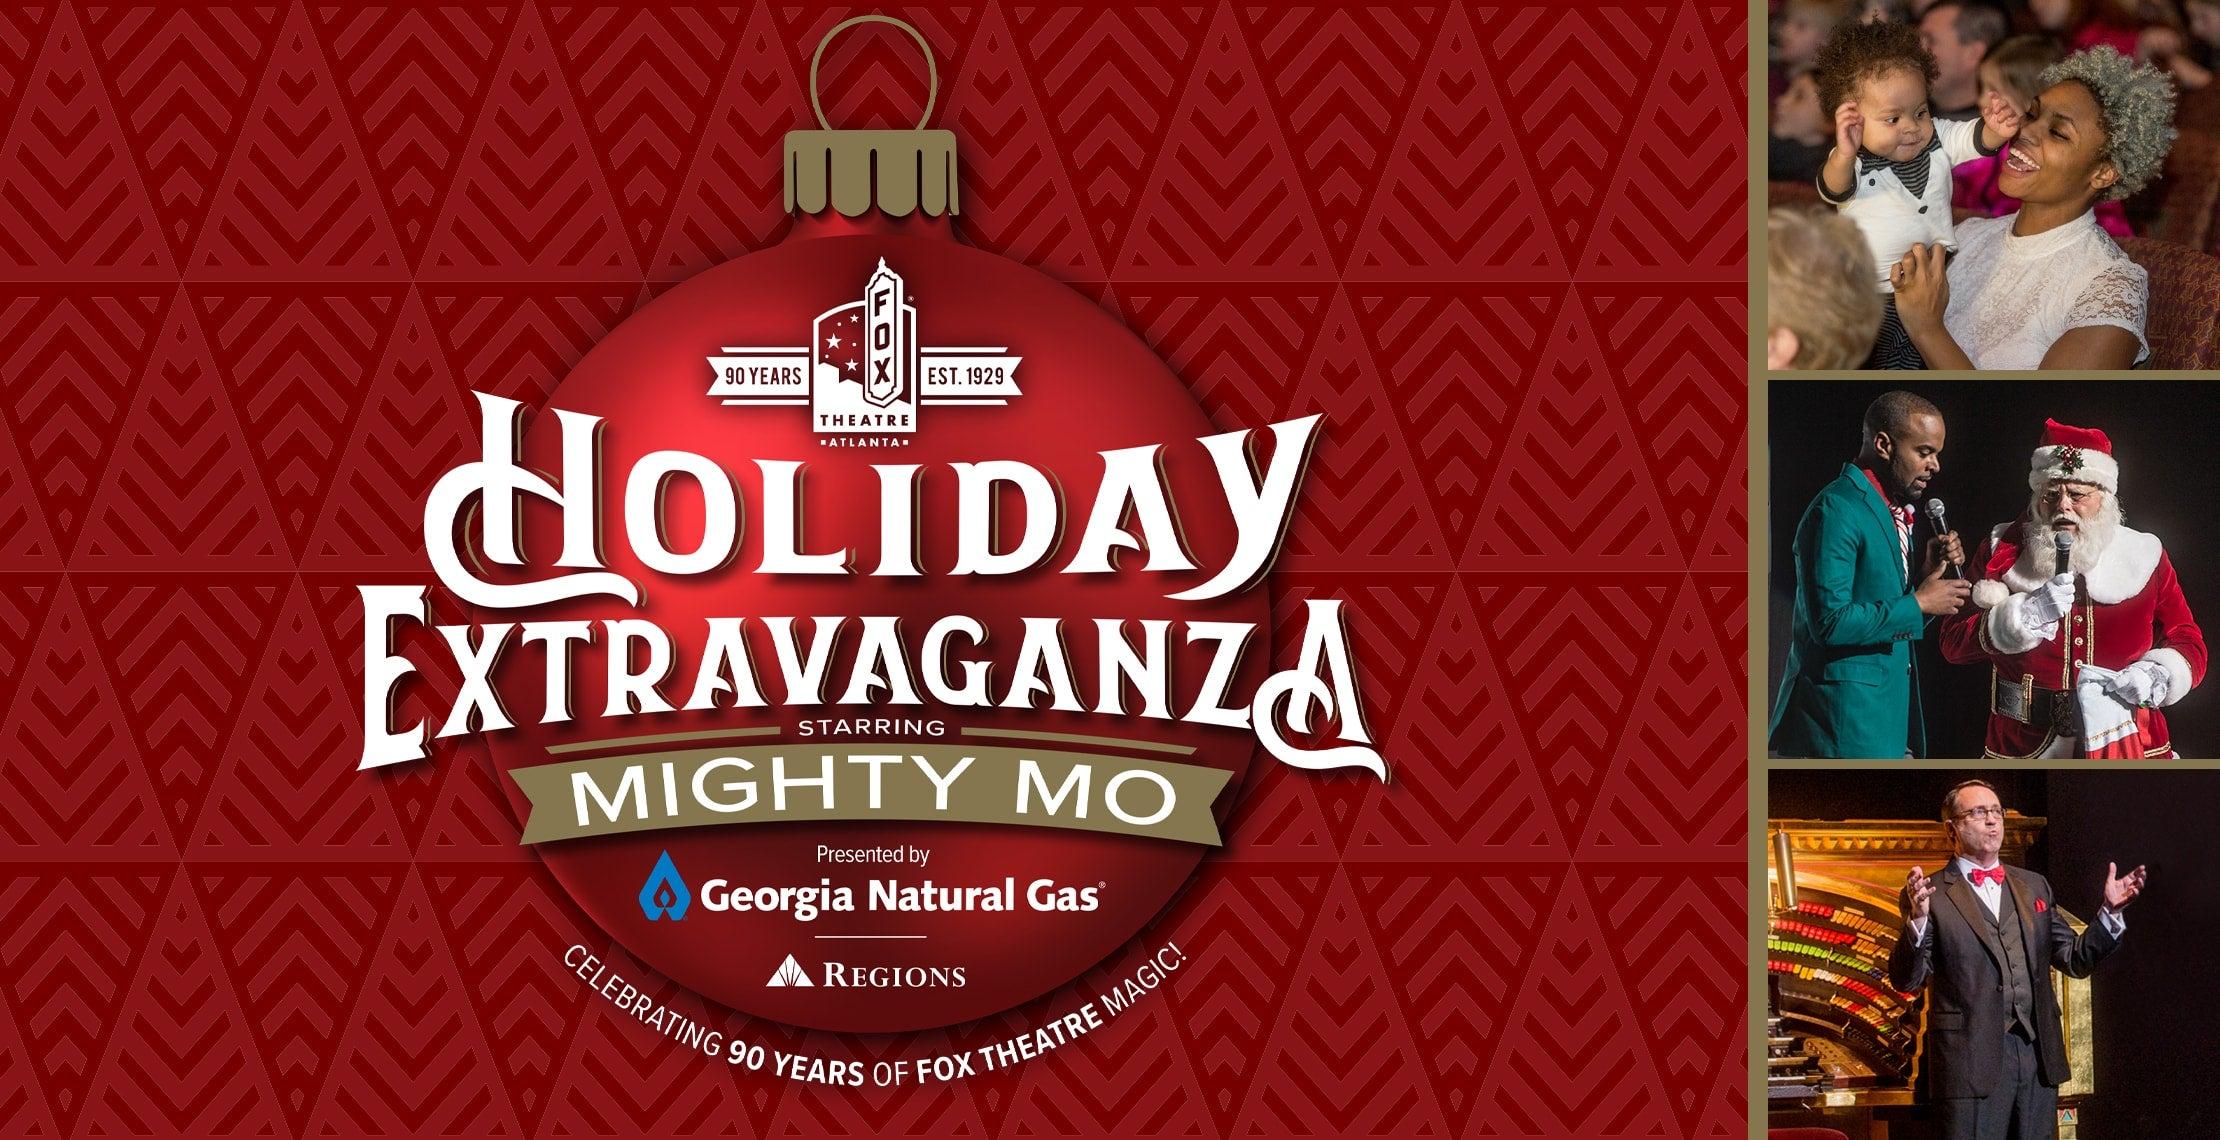 Holiday Extravaganza Starring Mighty Mo!